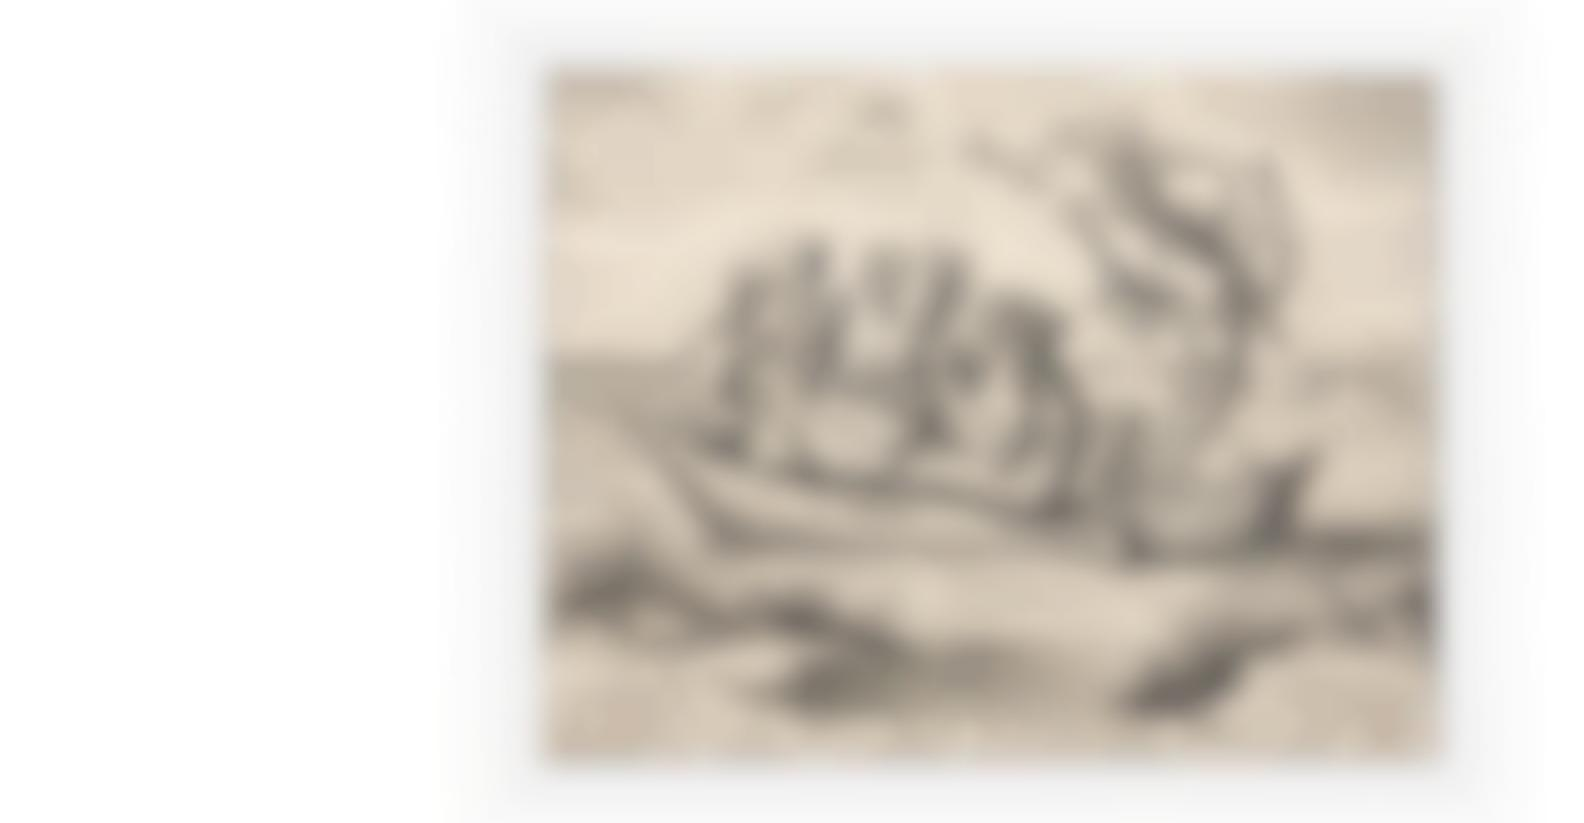 After Hieronymous Bosch - Die Blau Schuyte (The Ship Of Fools) (Hollstein 20)-1559